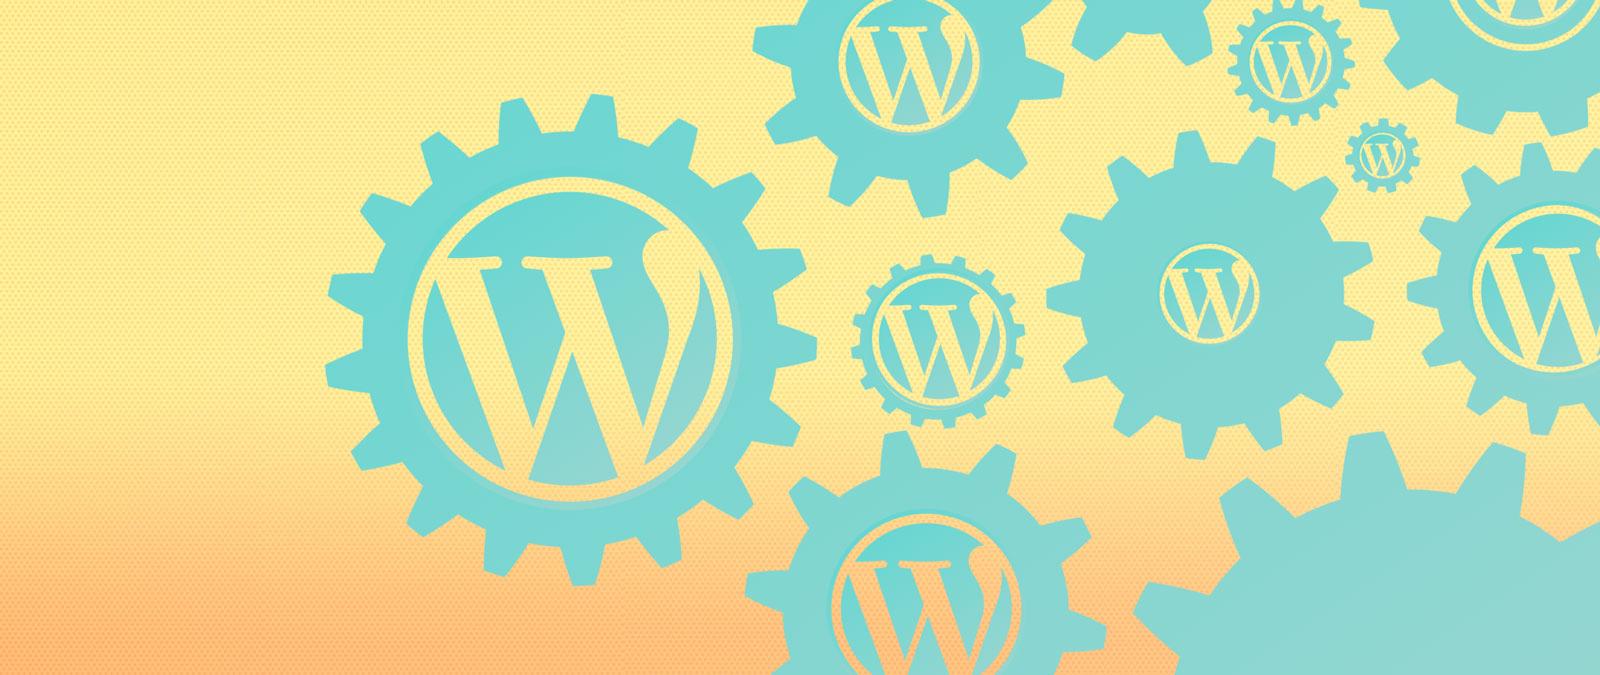 wordpress-errors-wdw